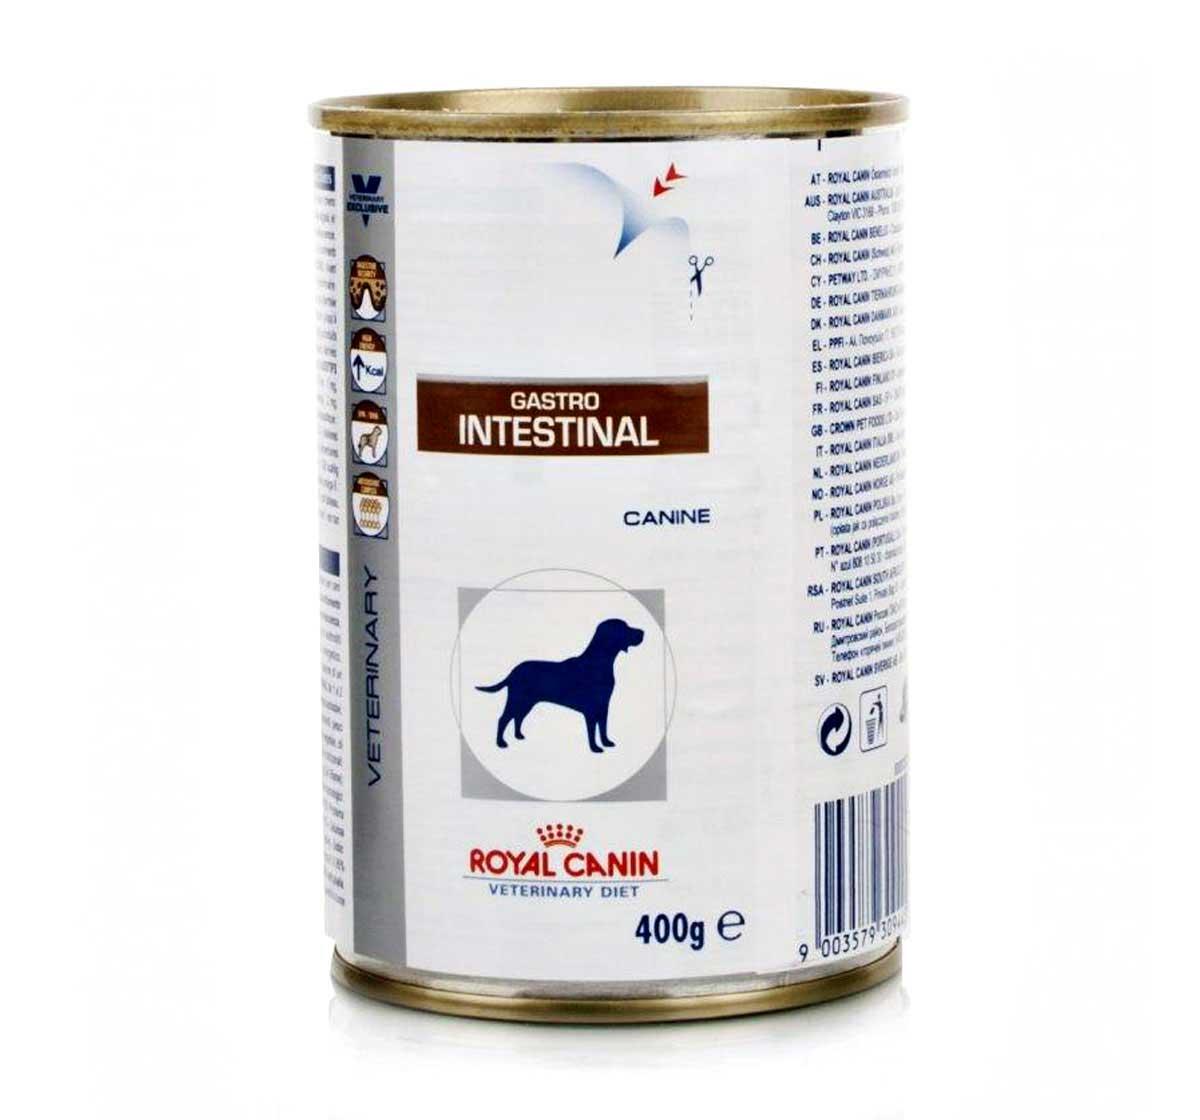 royal canin veterinary diet intestinal dog canned food 400 gm prescription dog food. Black Bedroom Furniture Sets. Home Design Ideas